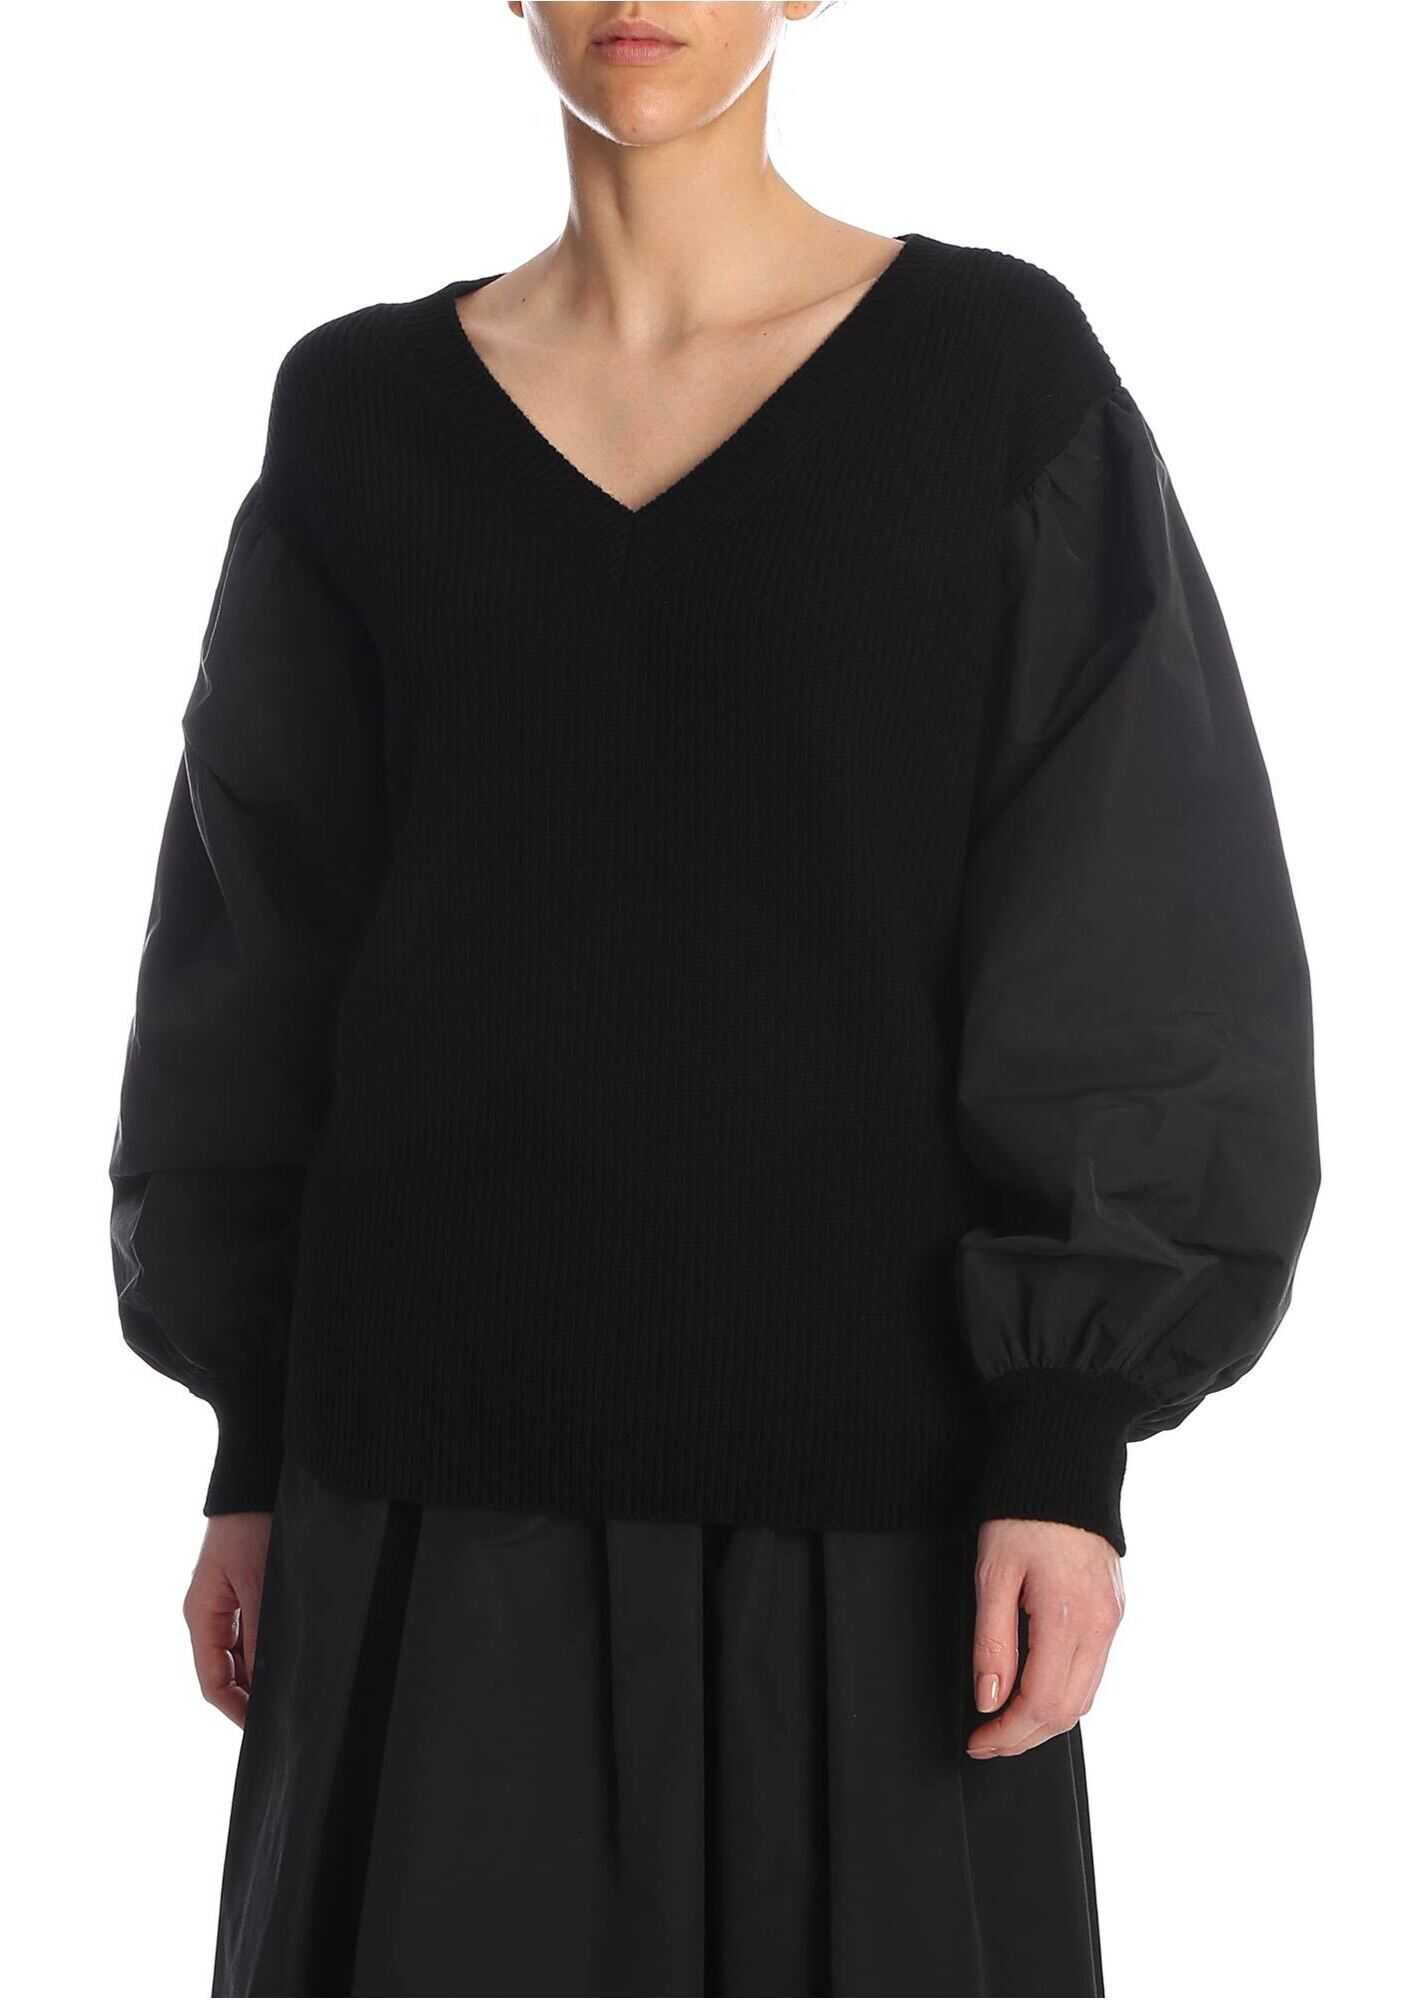 Valentino Garavani Balloon Sleeves Sweater In Black Black